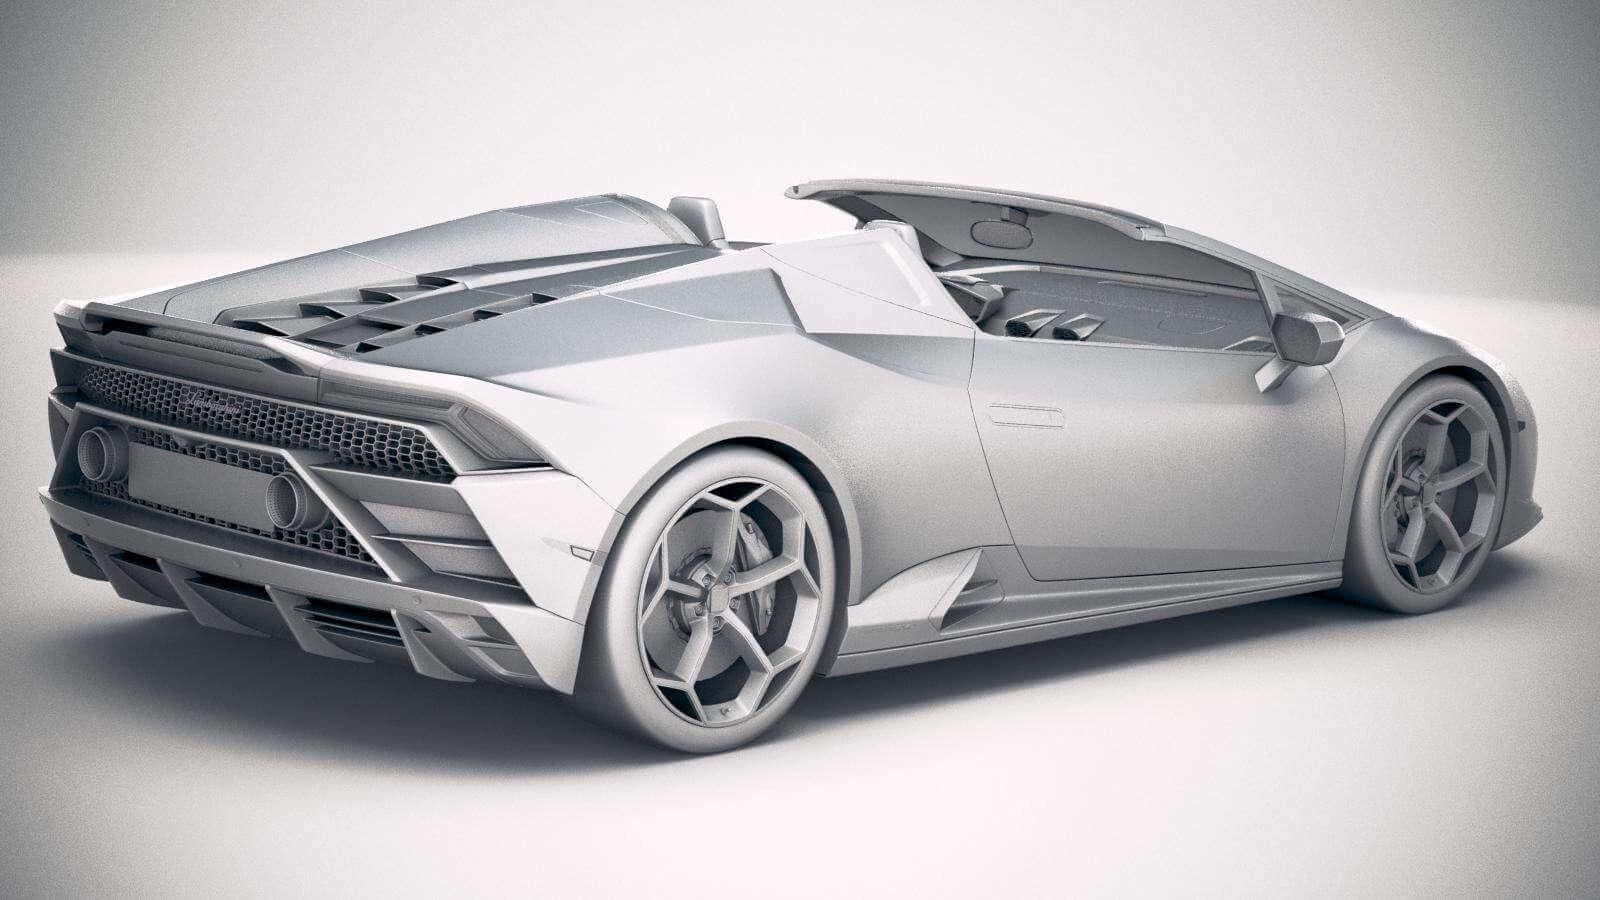 Lamborghini Huracan Evo Spyder 2019 3d Model